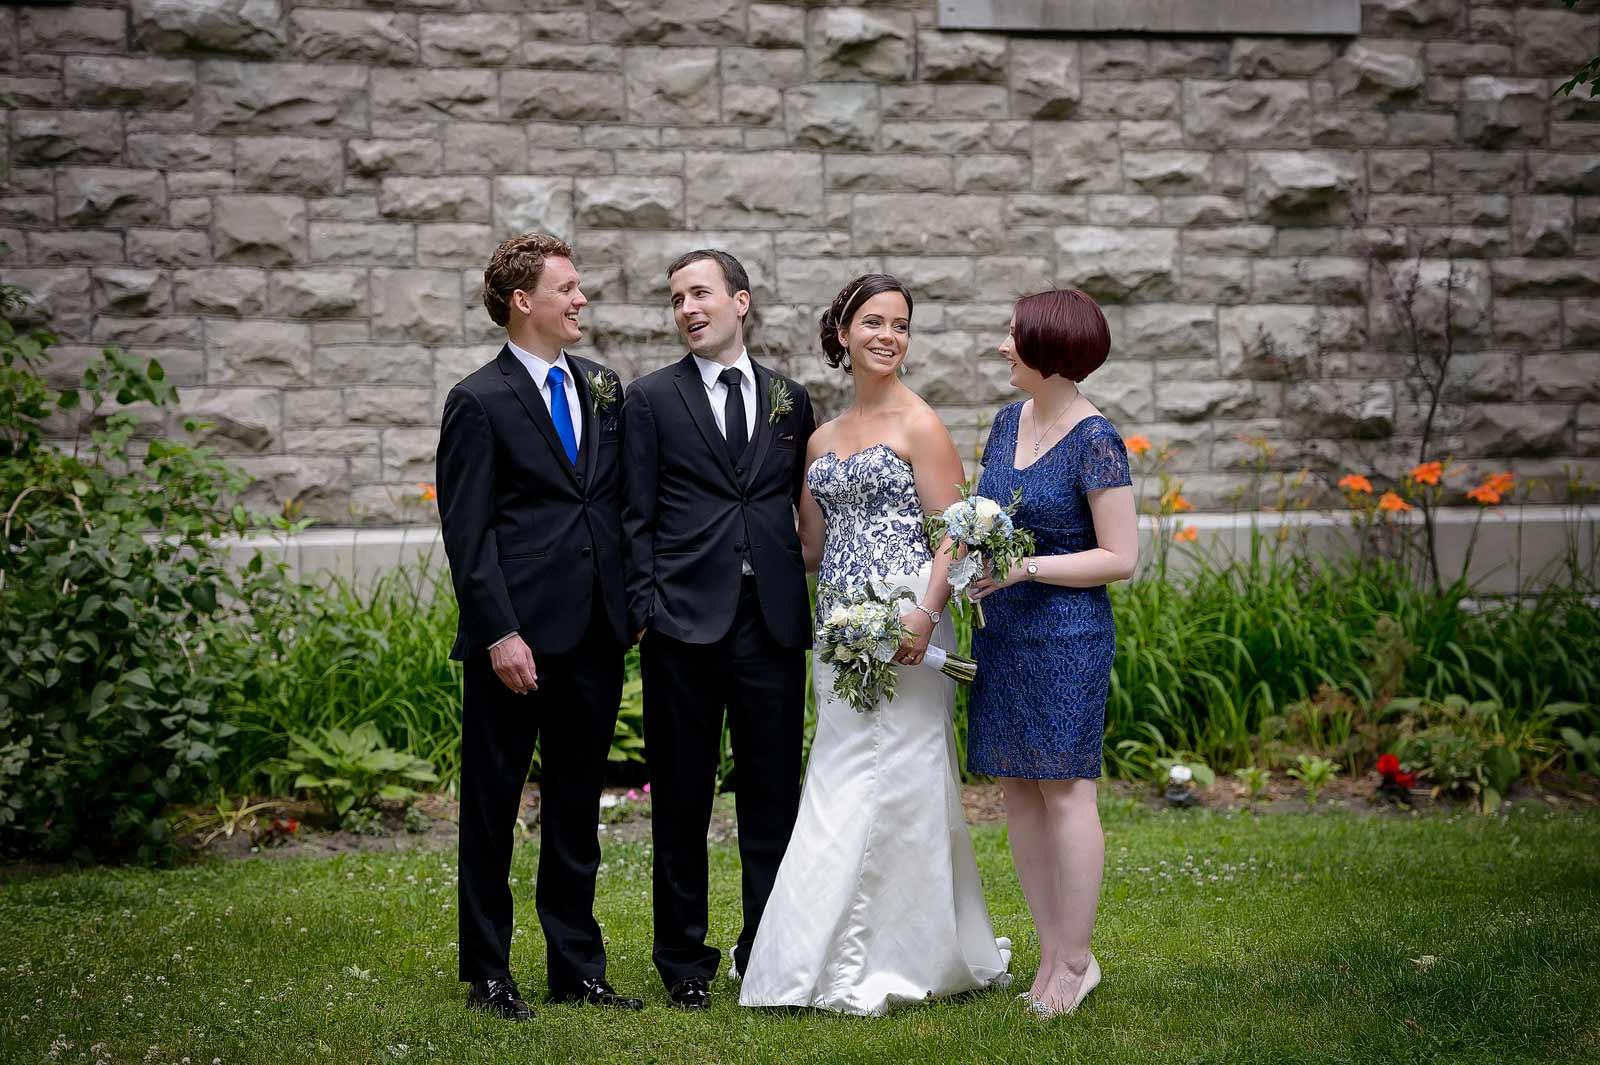 SamanthaBrian-wedding-sneakpeek-04